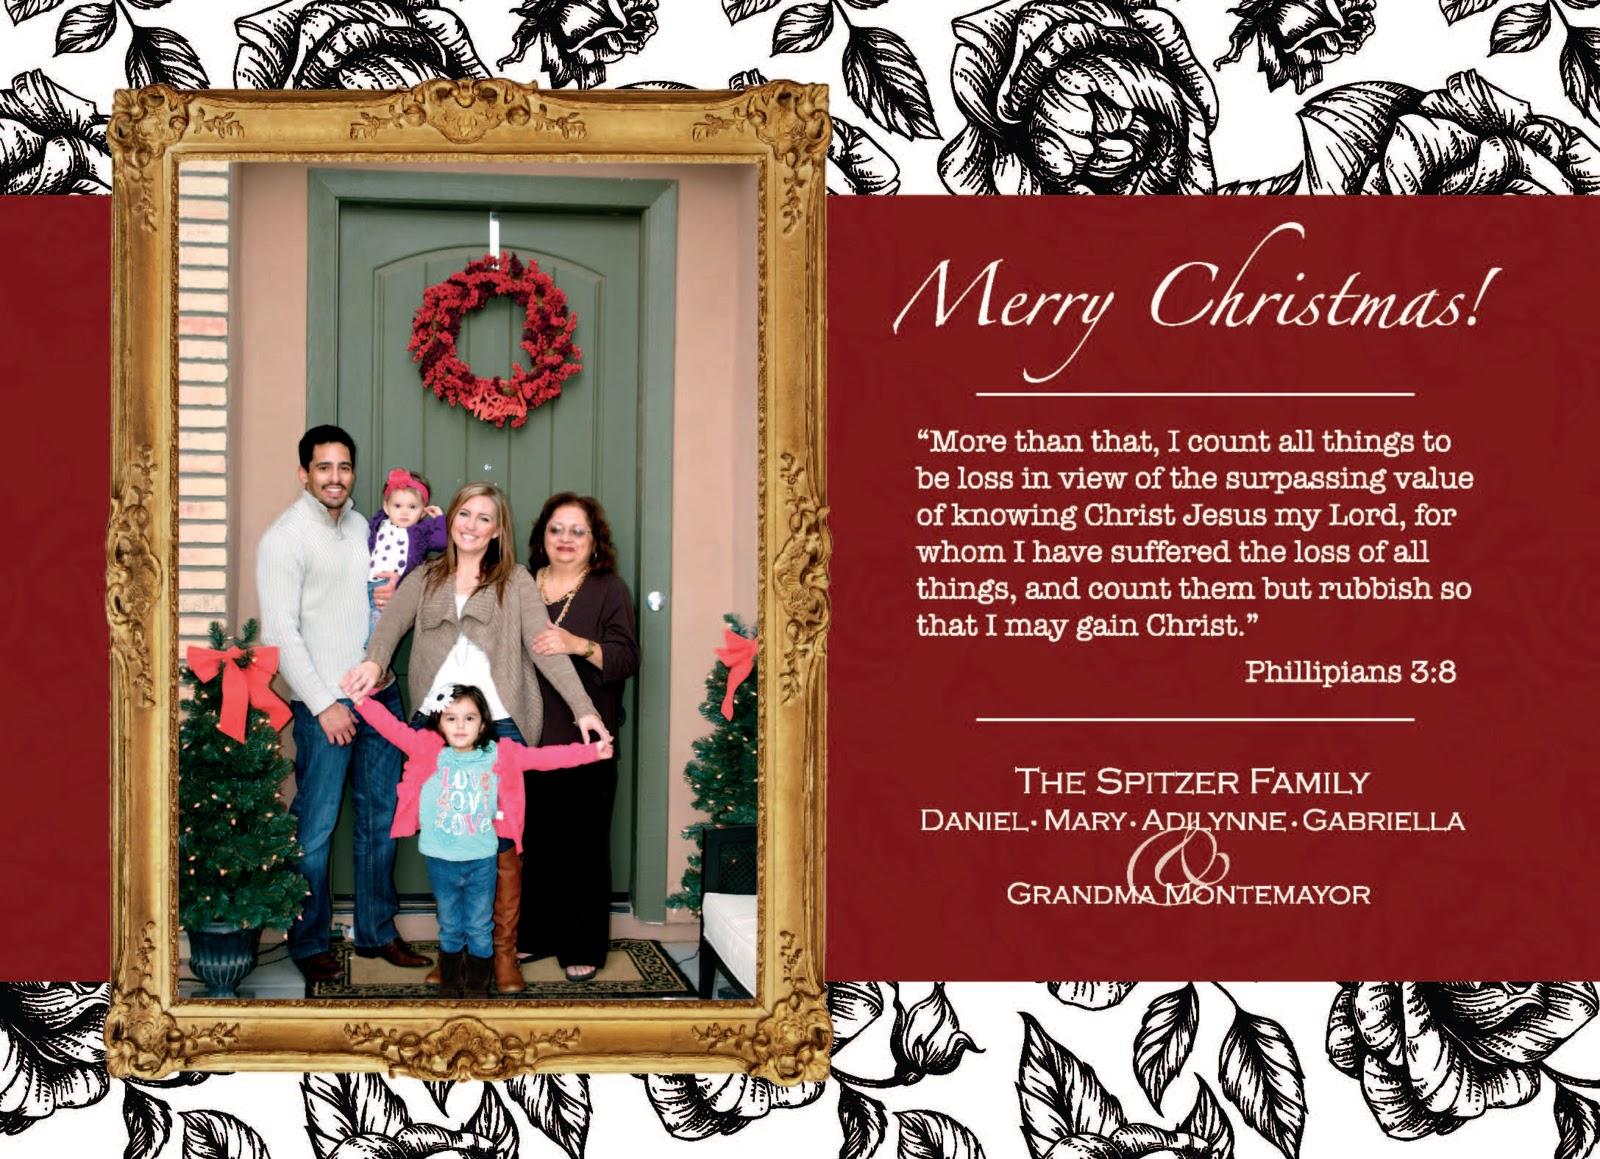 DIY Custom Christmas Cards | because i like to decorate...: becauseiliketodecorate.blogspot.com/2011/11/diy-custom-christmas...